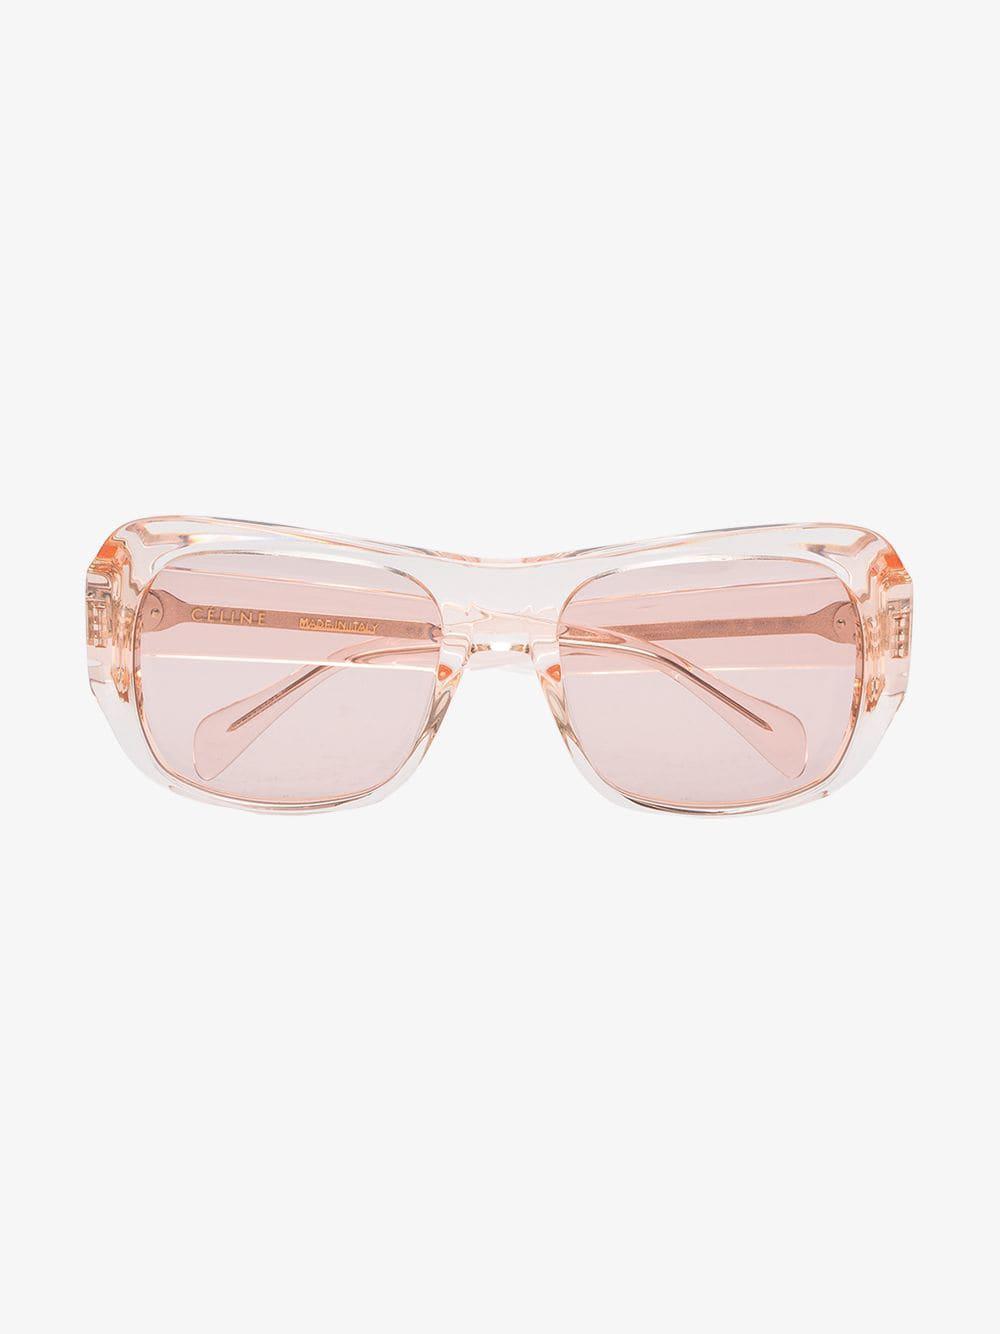 79ee562d7a2 Céline Celine Eyewear Pink Rectangular Sunglasses in Pink - Lyst